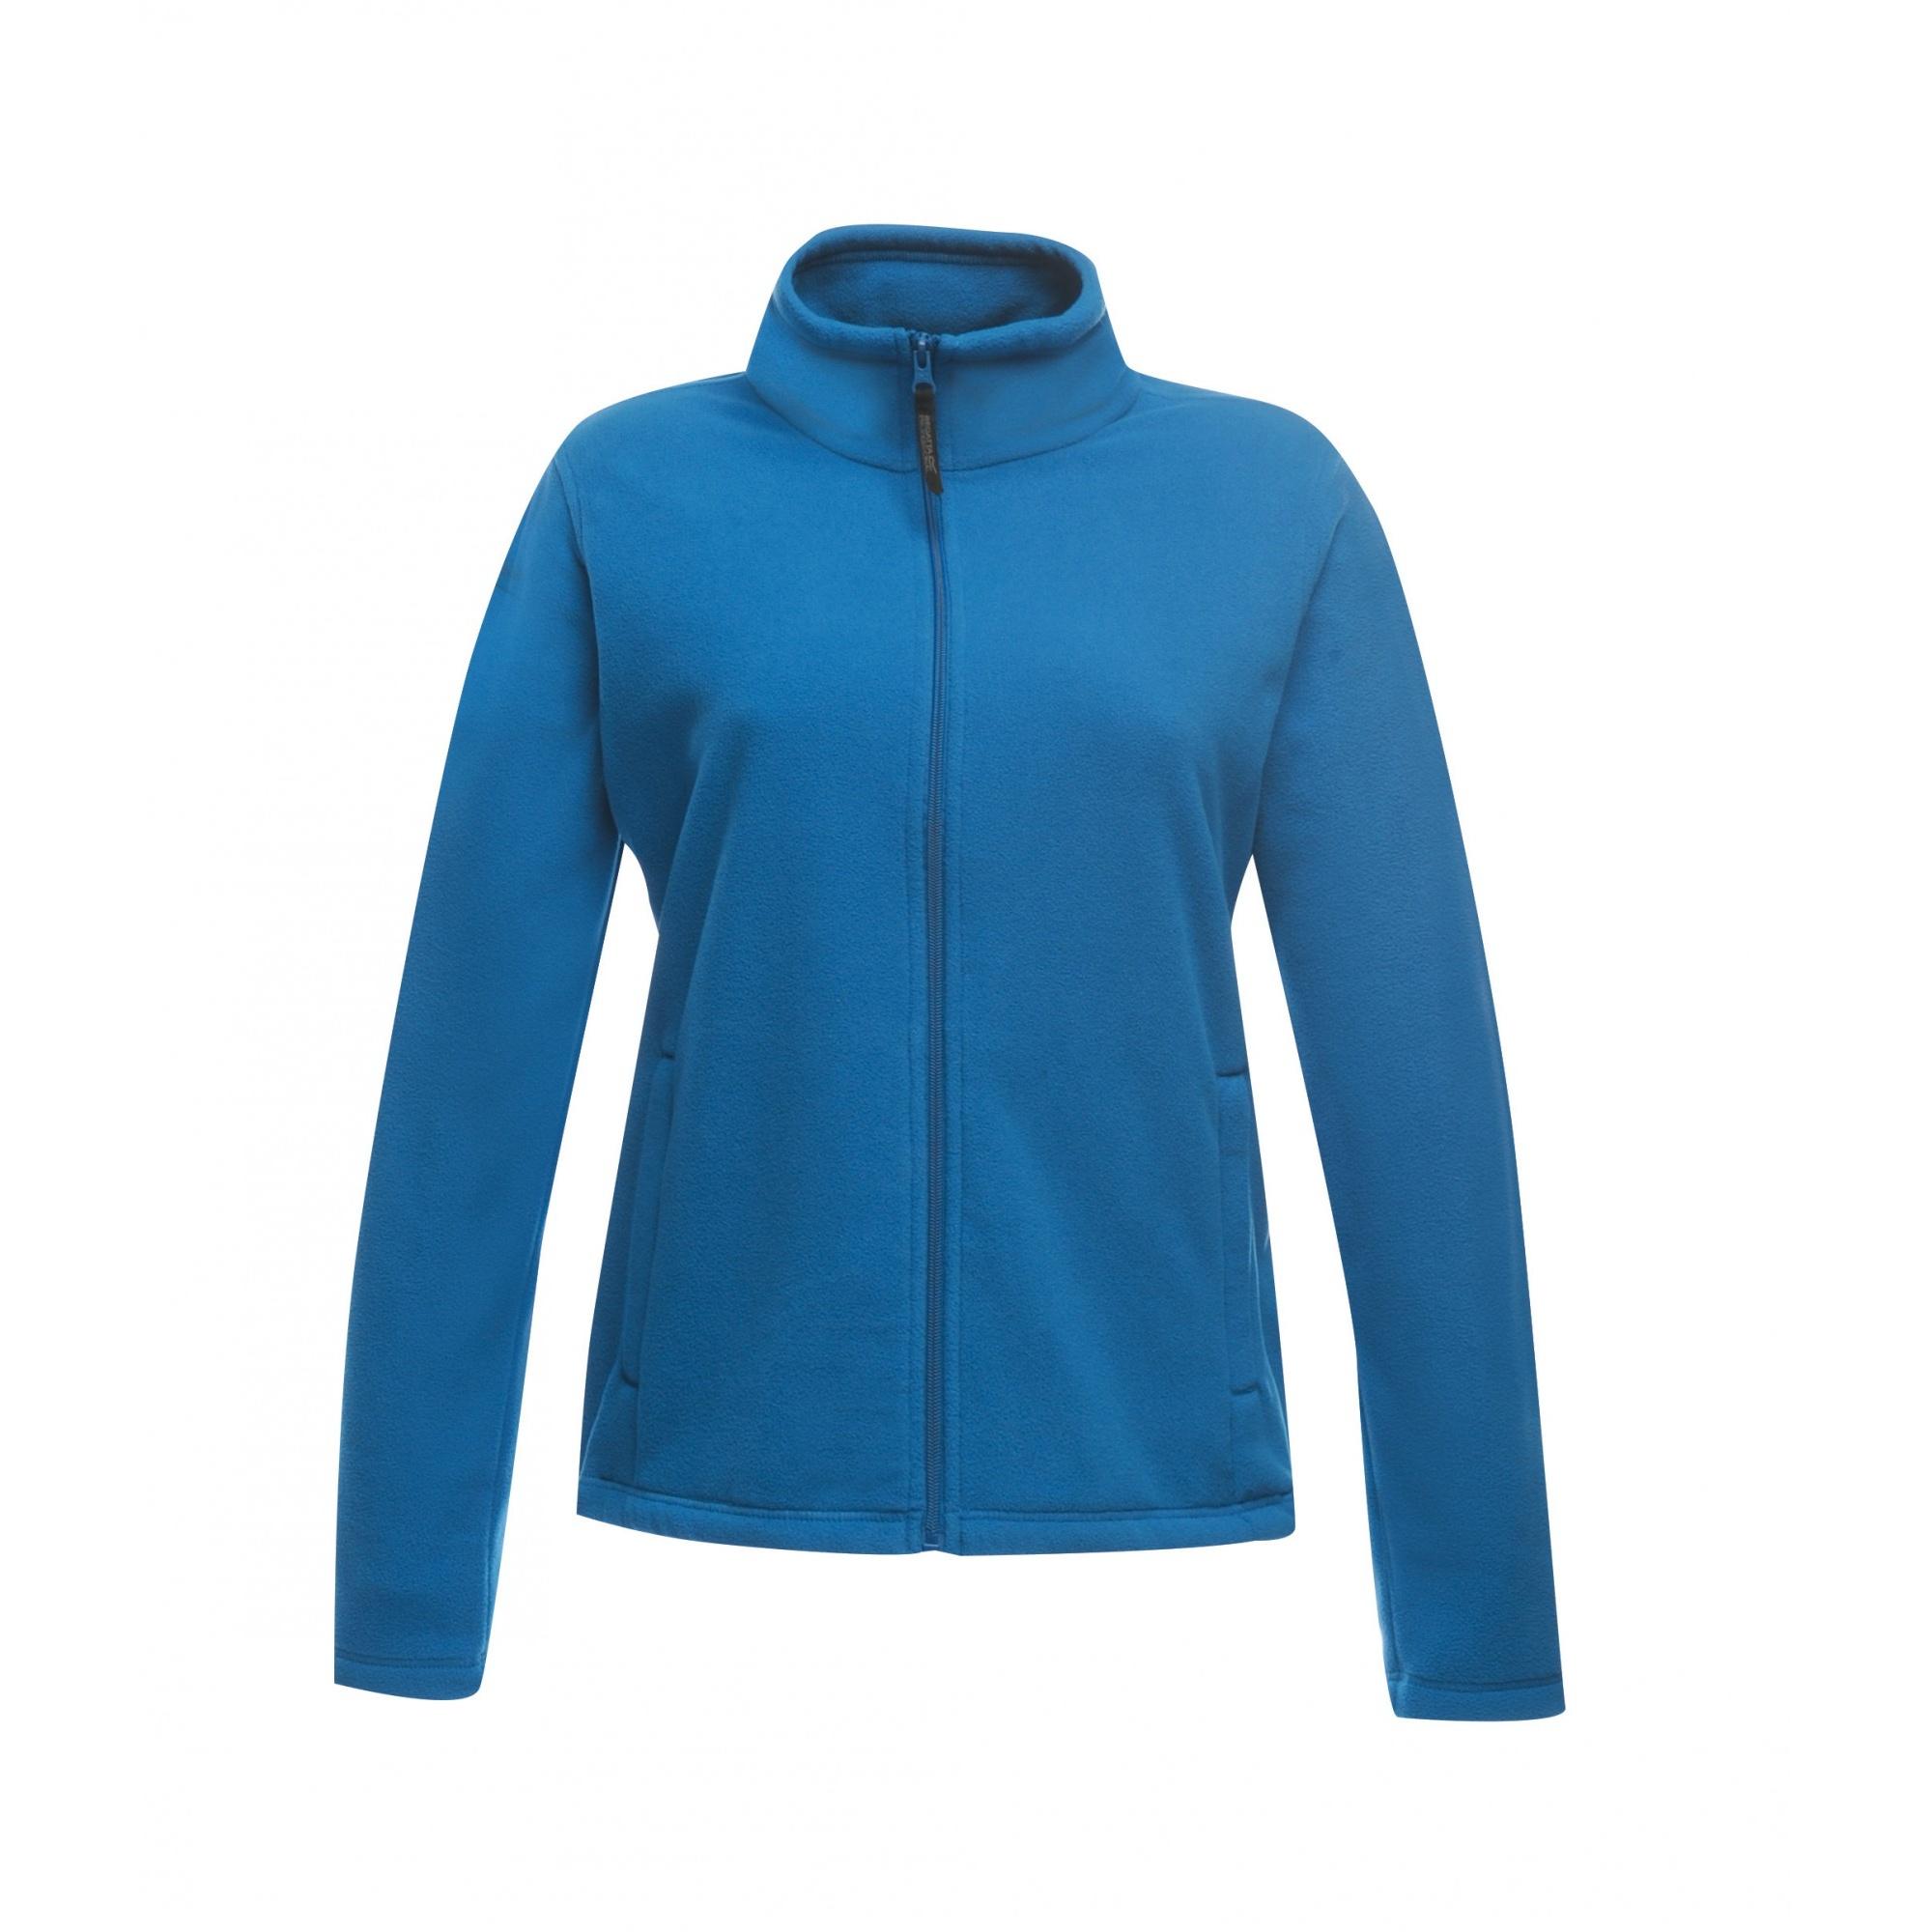 Regatta Womens/Ladies Full-Zip 210 Series Microfleece Jacket (10) (Black)